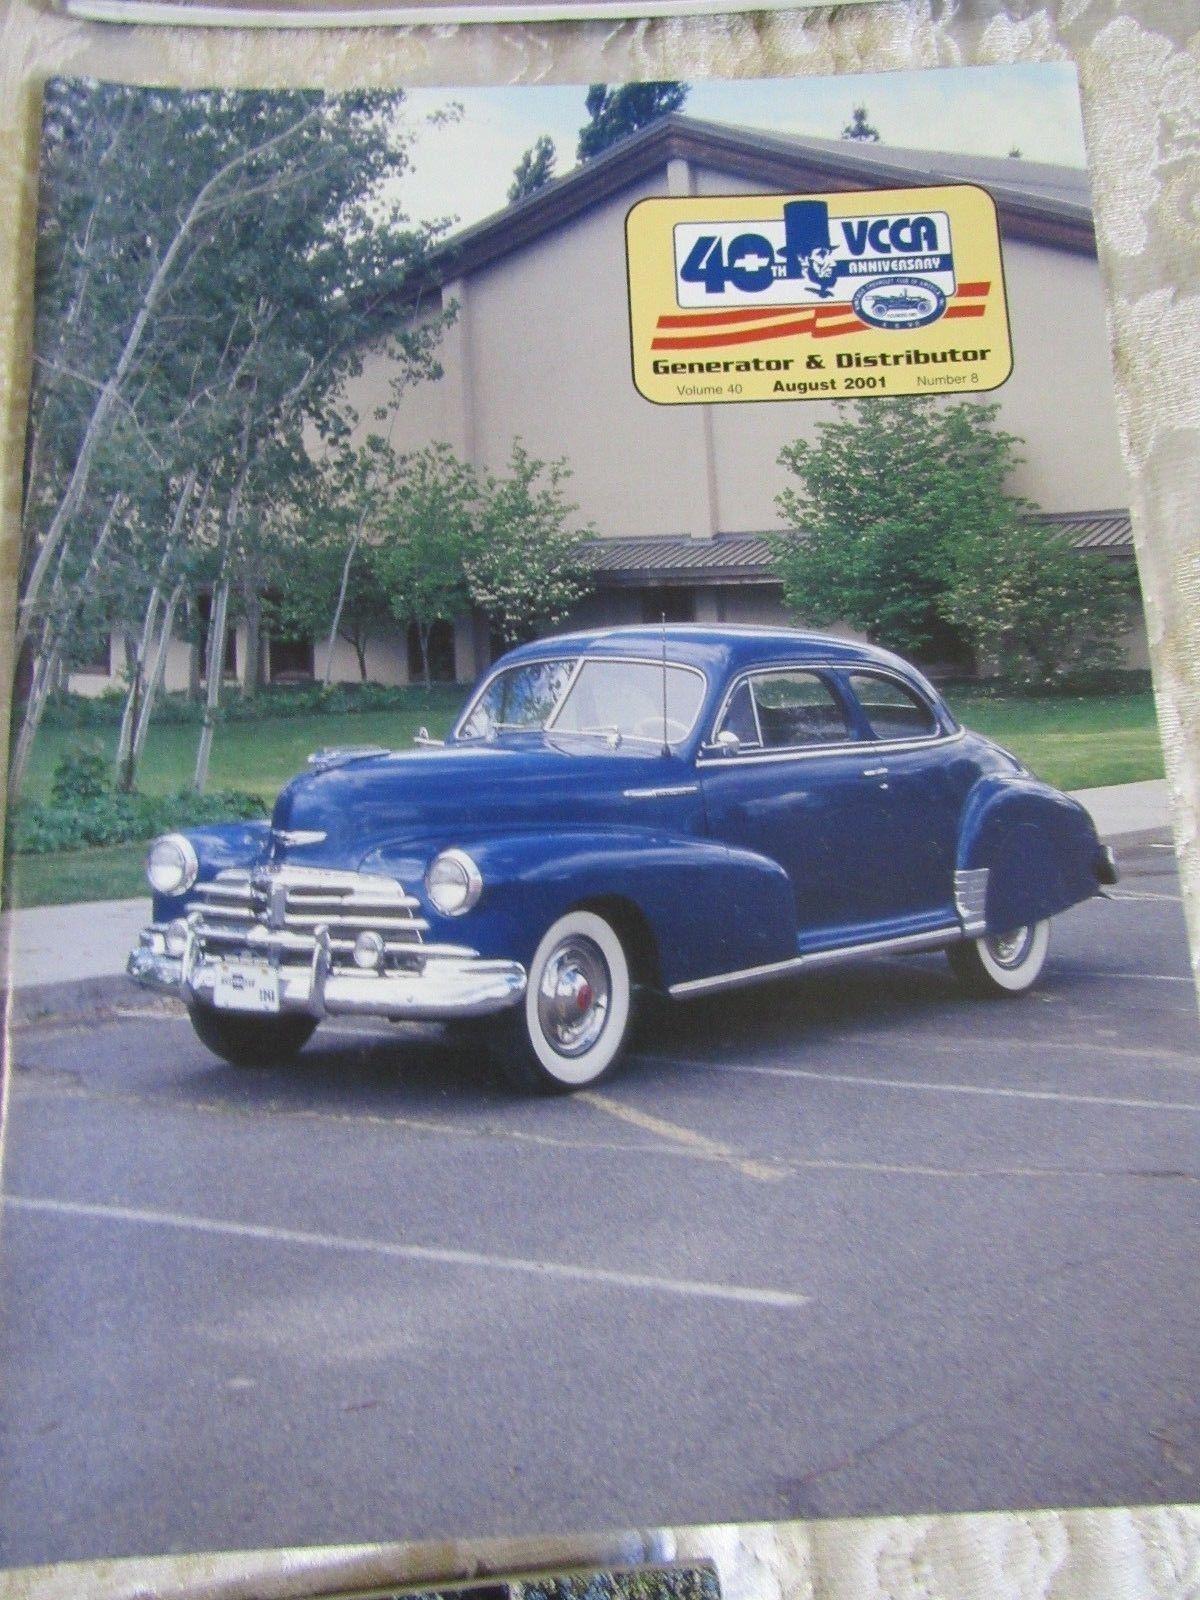 Lot Generator & Distributor Magazine - 2001  40th Anniversary Issues of VCCA,